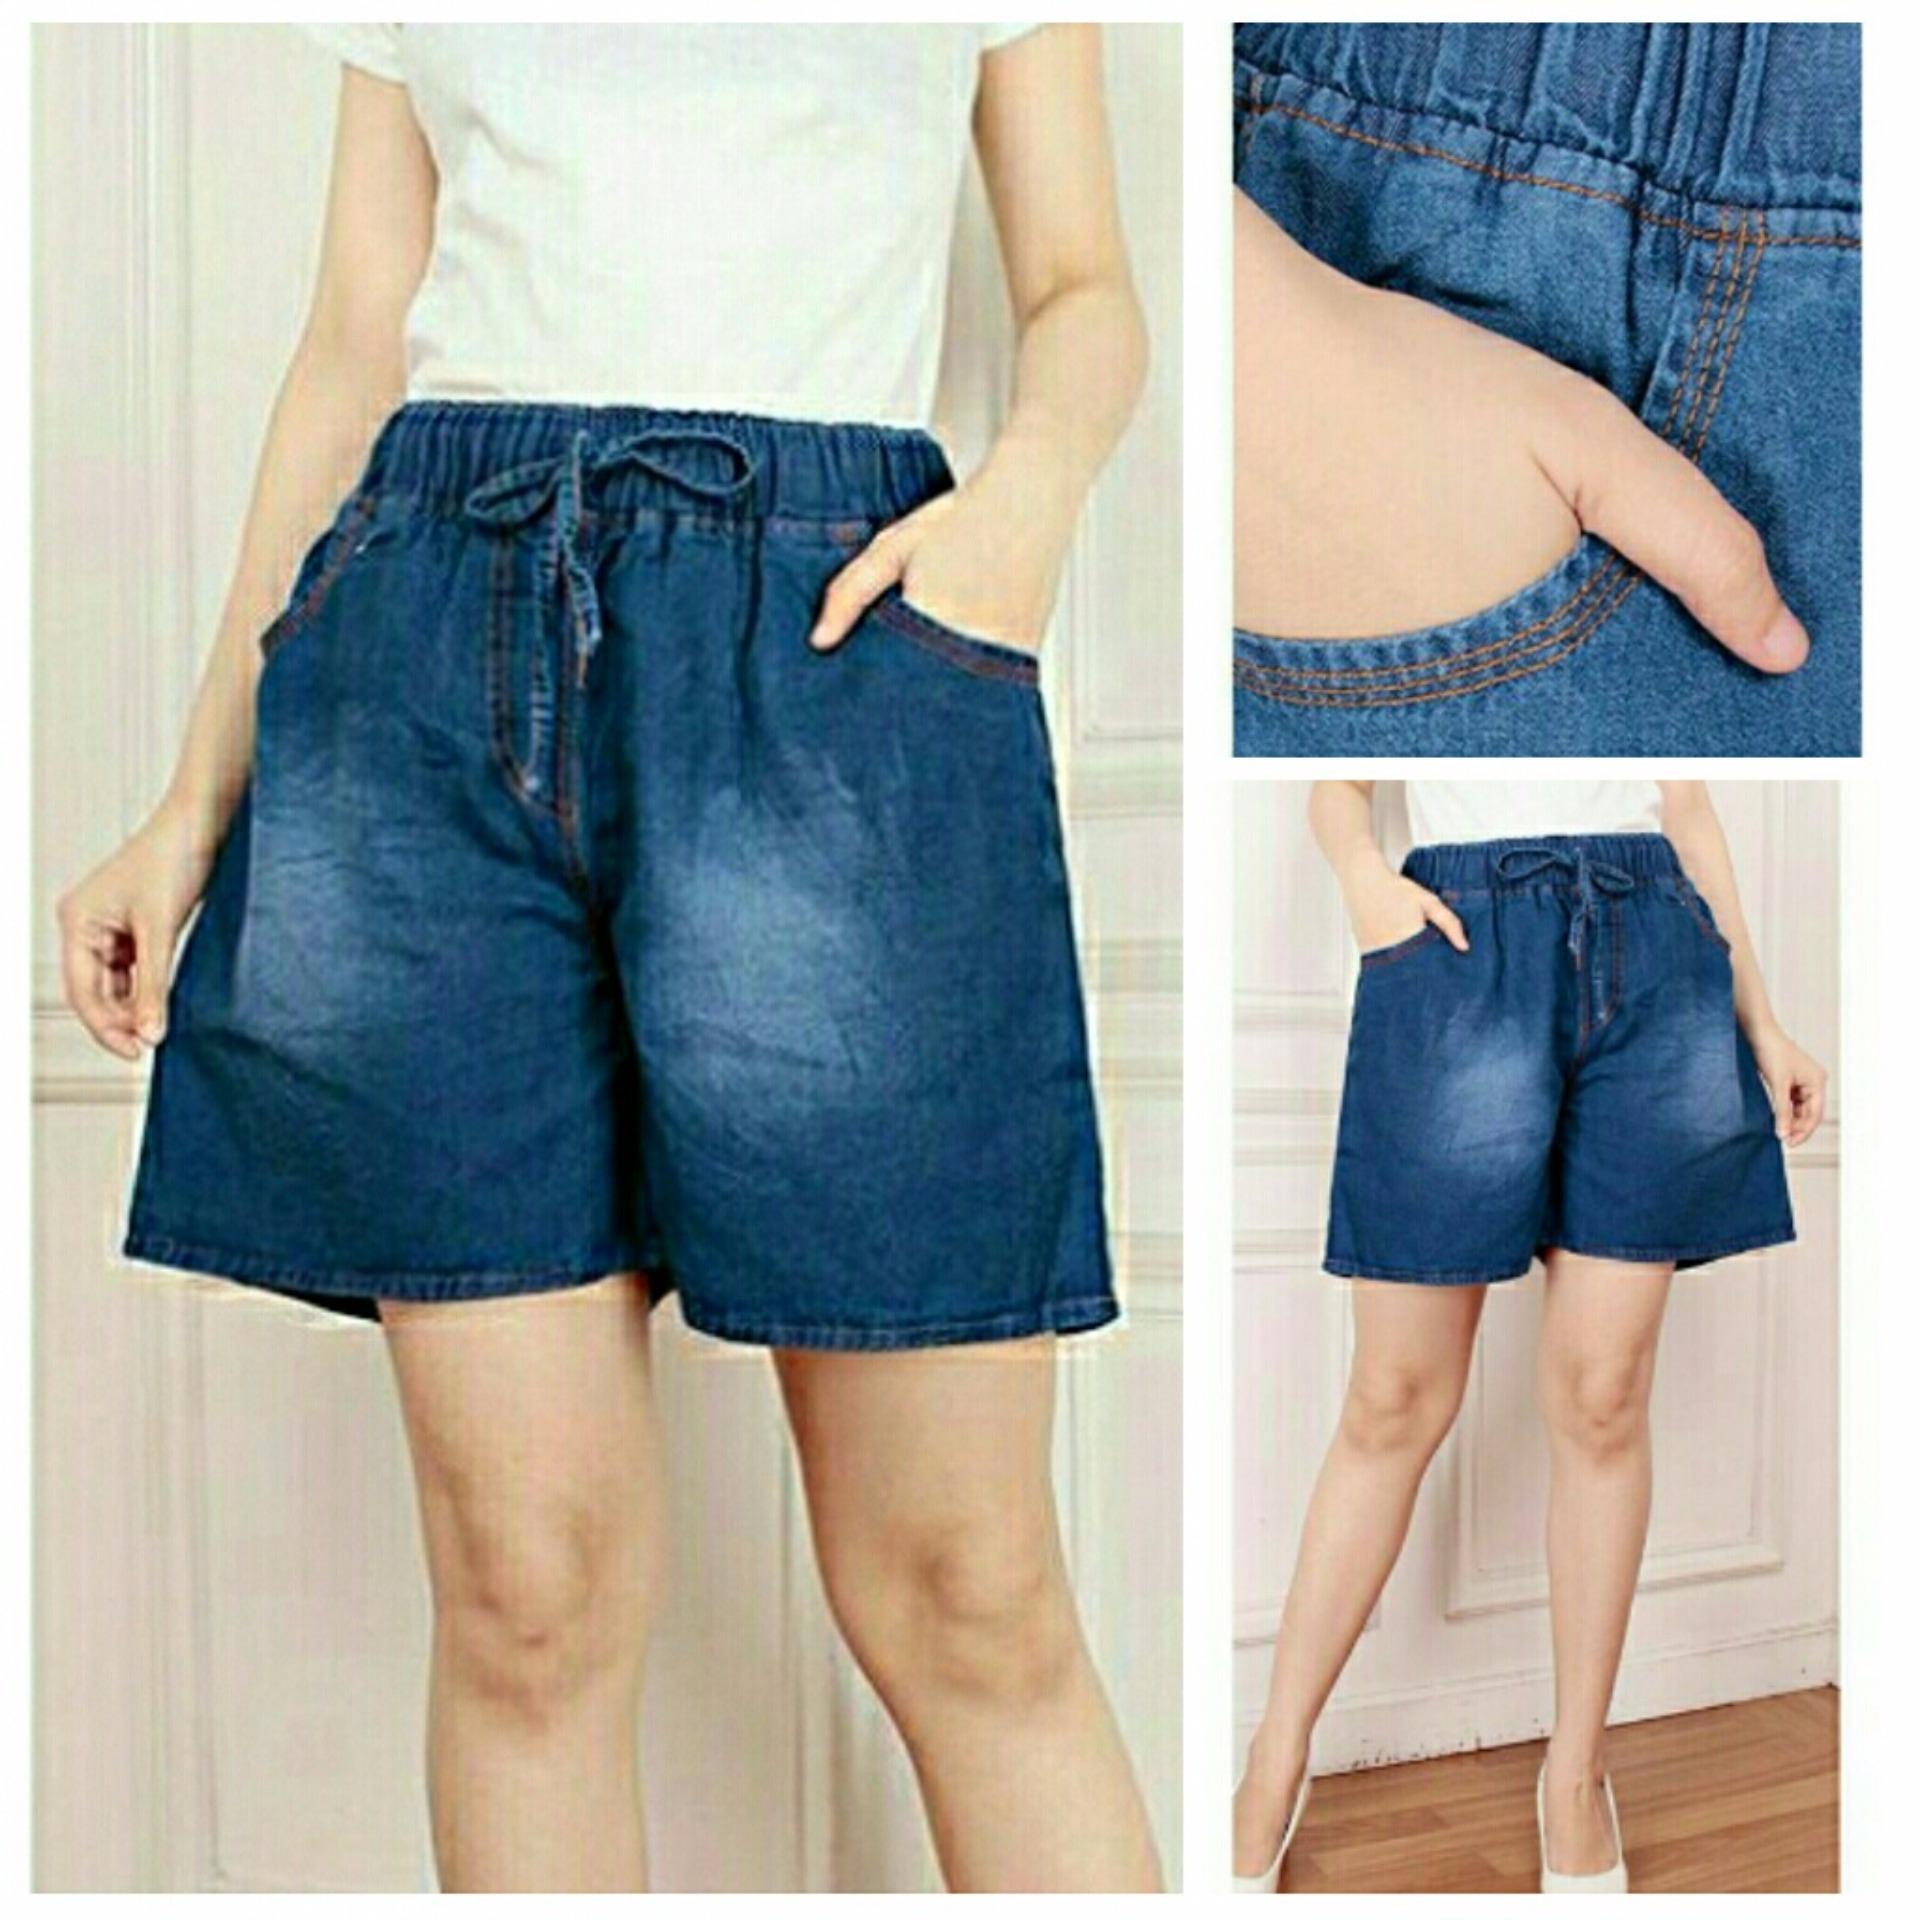 Jual Cj Collection Celana Jeans Jumbo Pendek Hotpant Wanita Jumbo Short Pant Savita Celana Murah